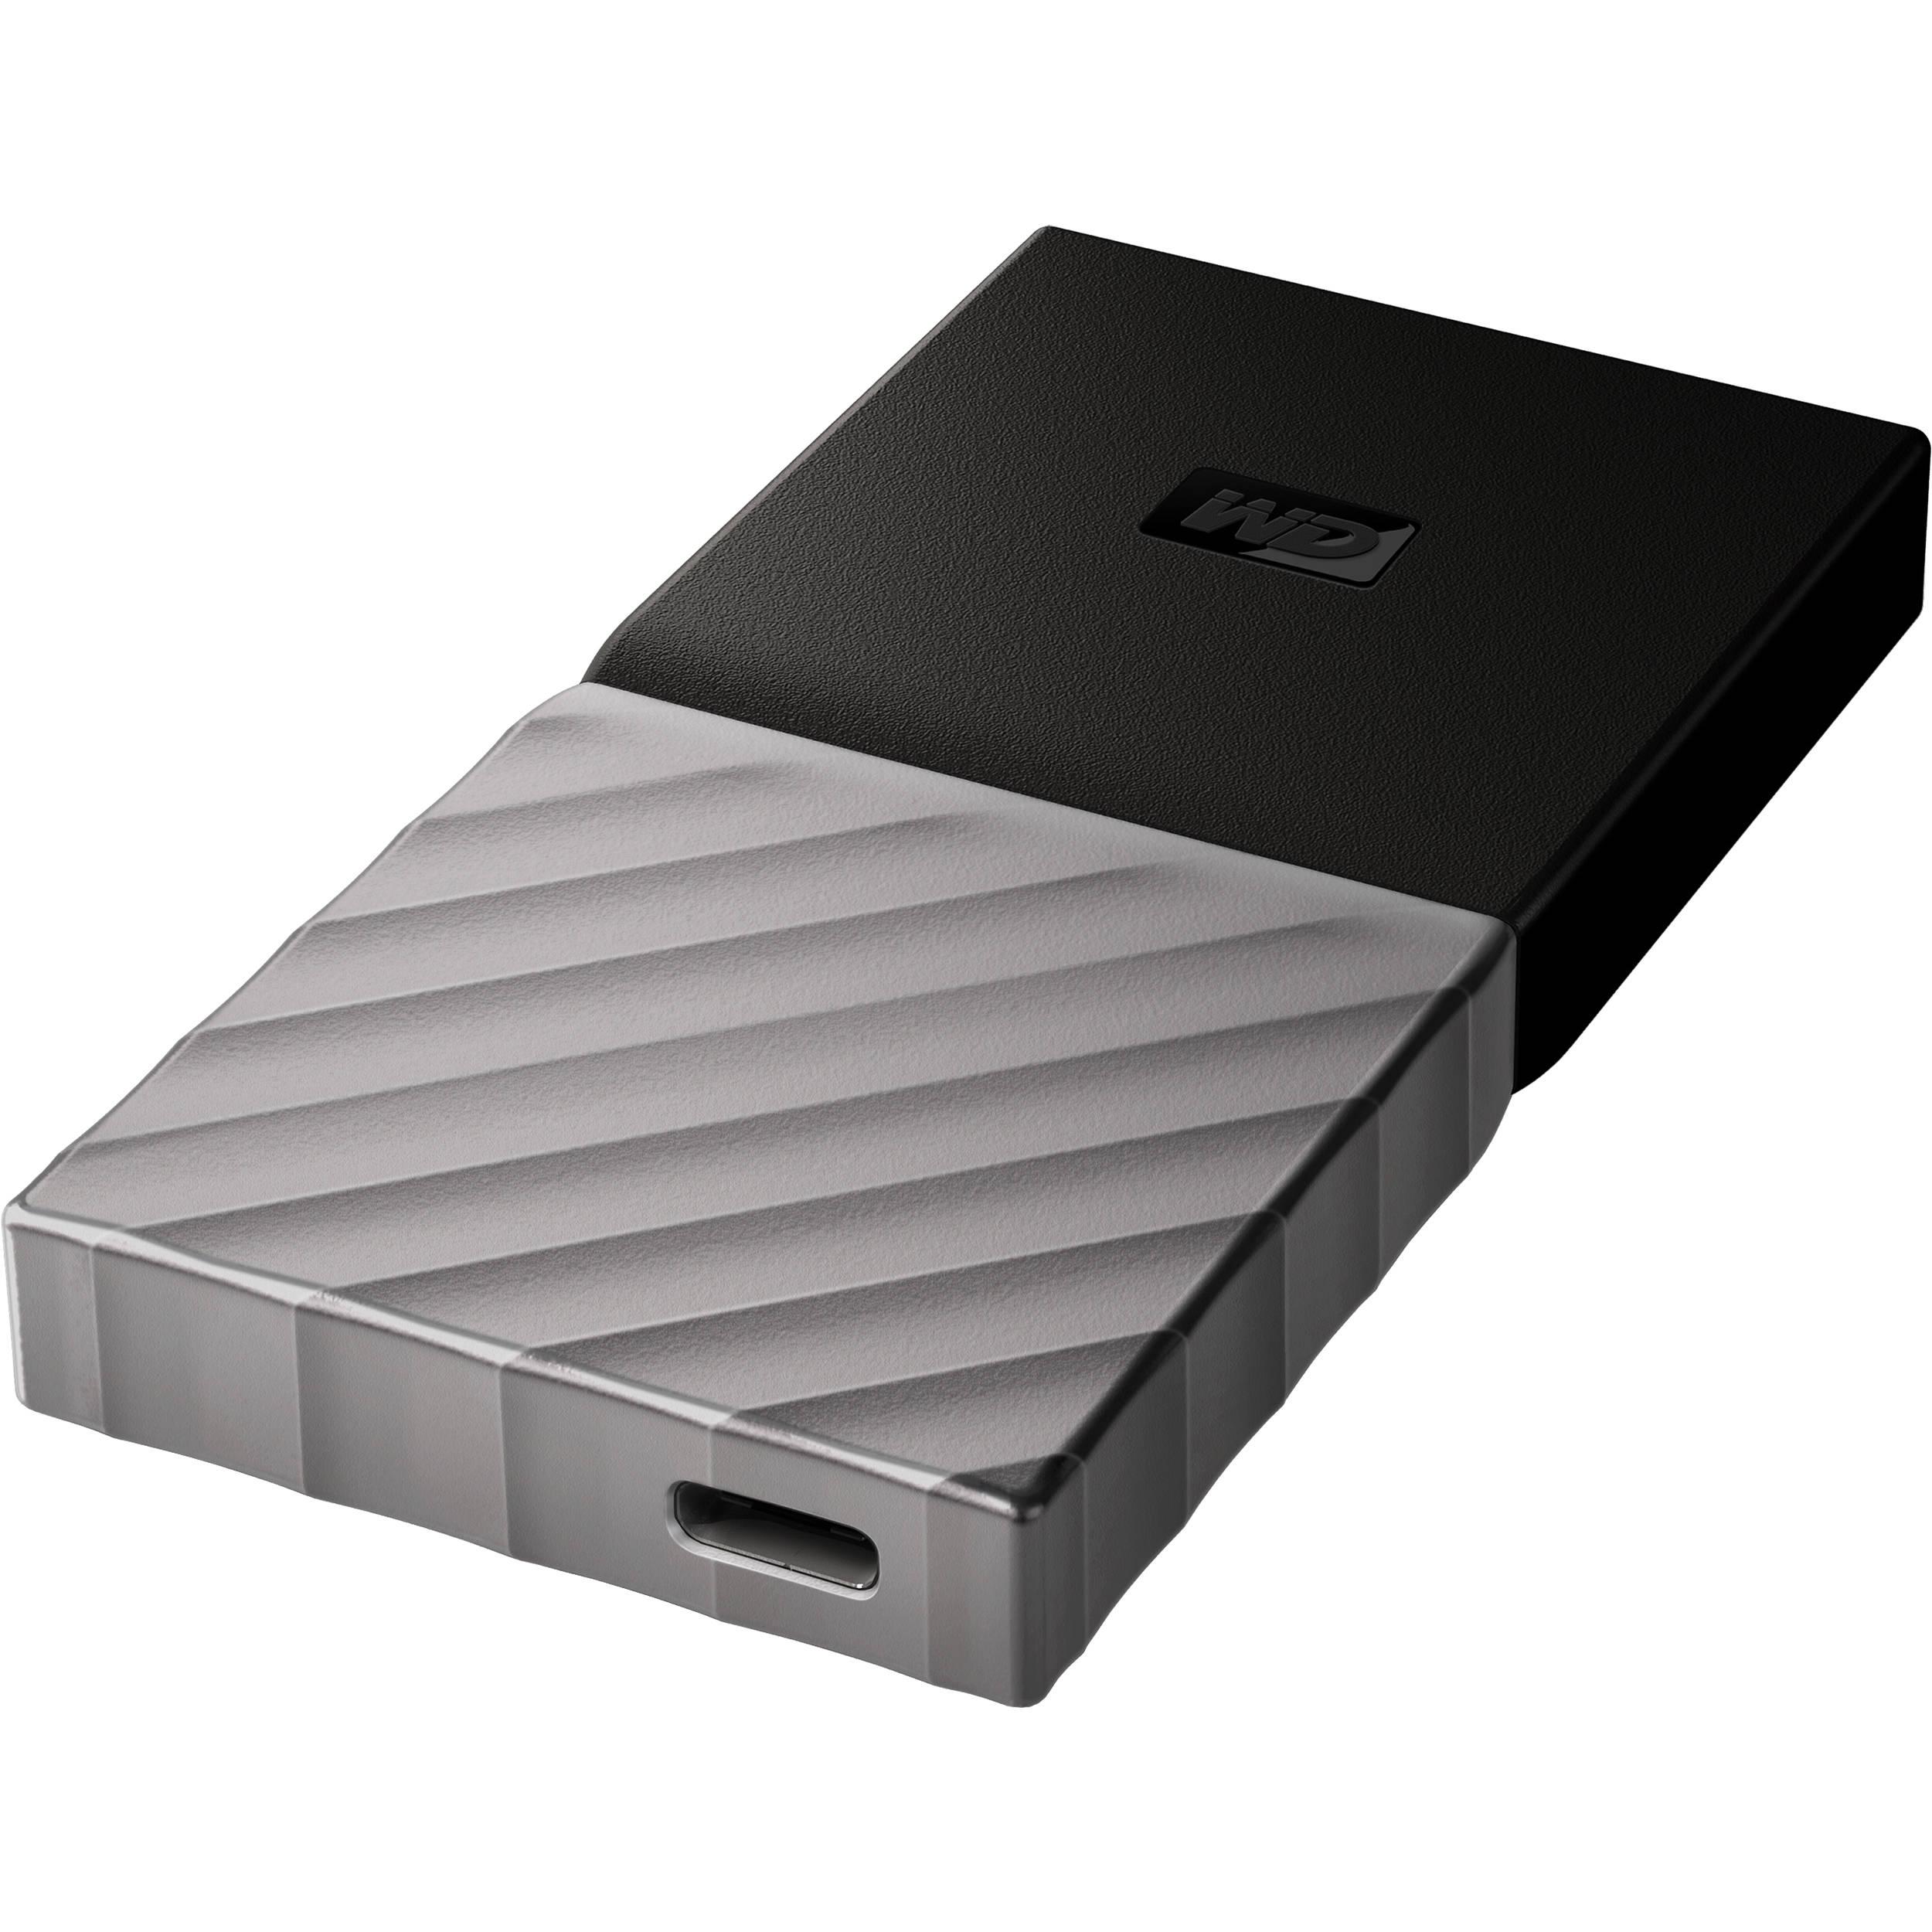 WD 1TB My Passport USB 3 1 Gen 2 External SSD